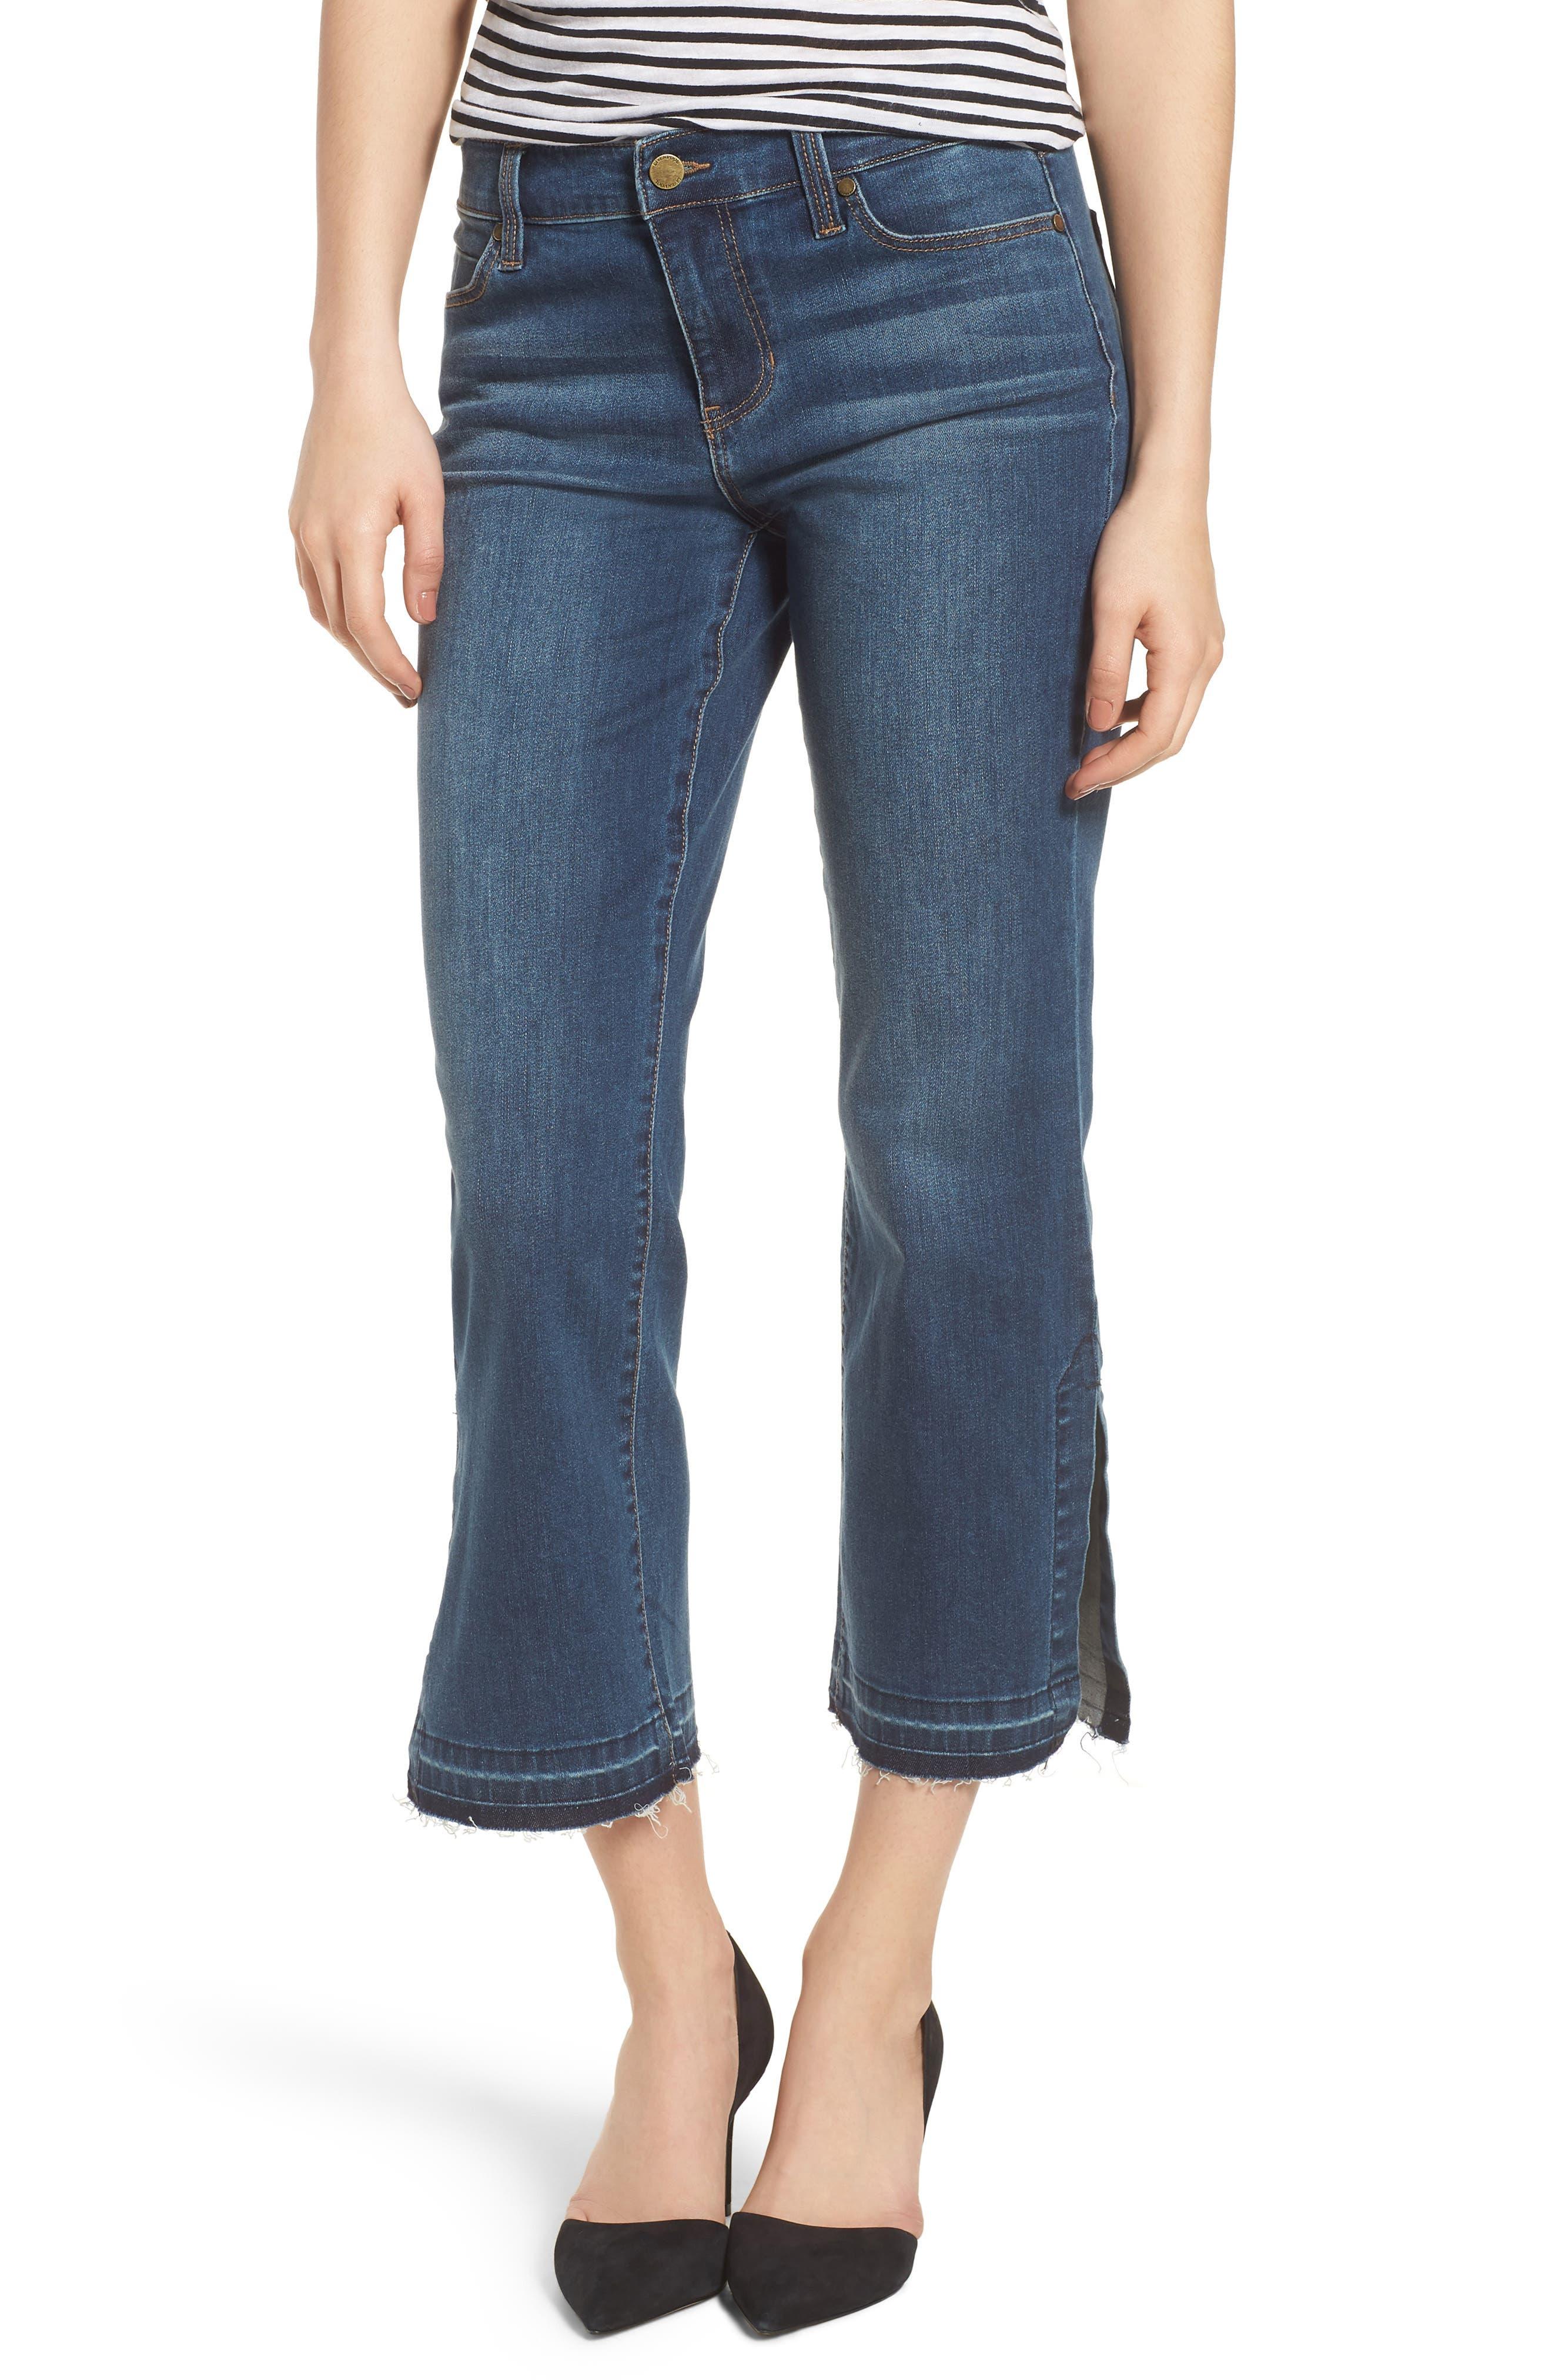 Tabitha Release Hem Crop Jeans,                         Main,                         color, 403